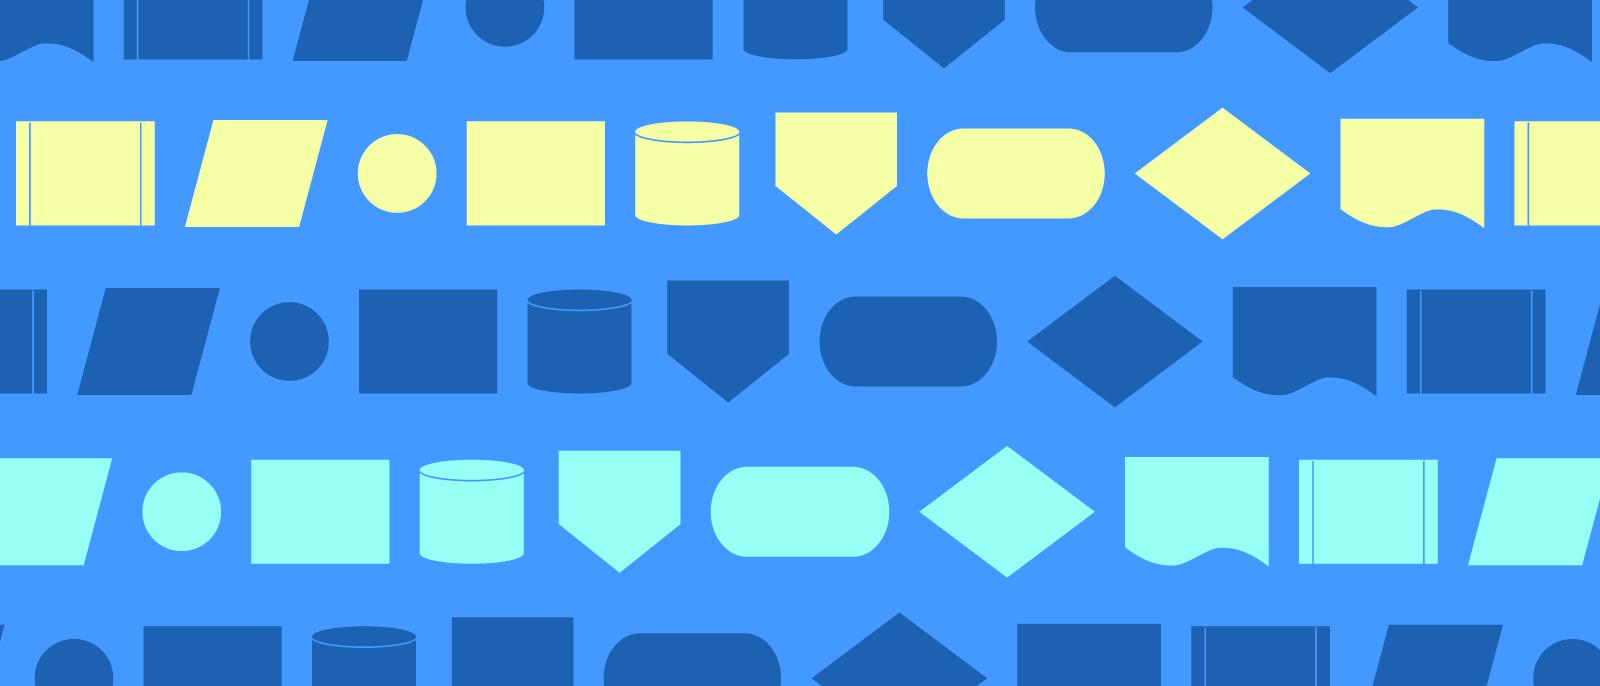 flowchart symbols and notation